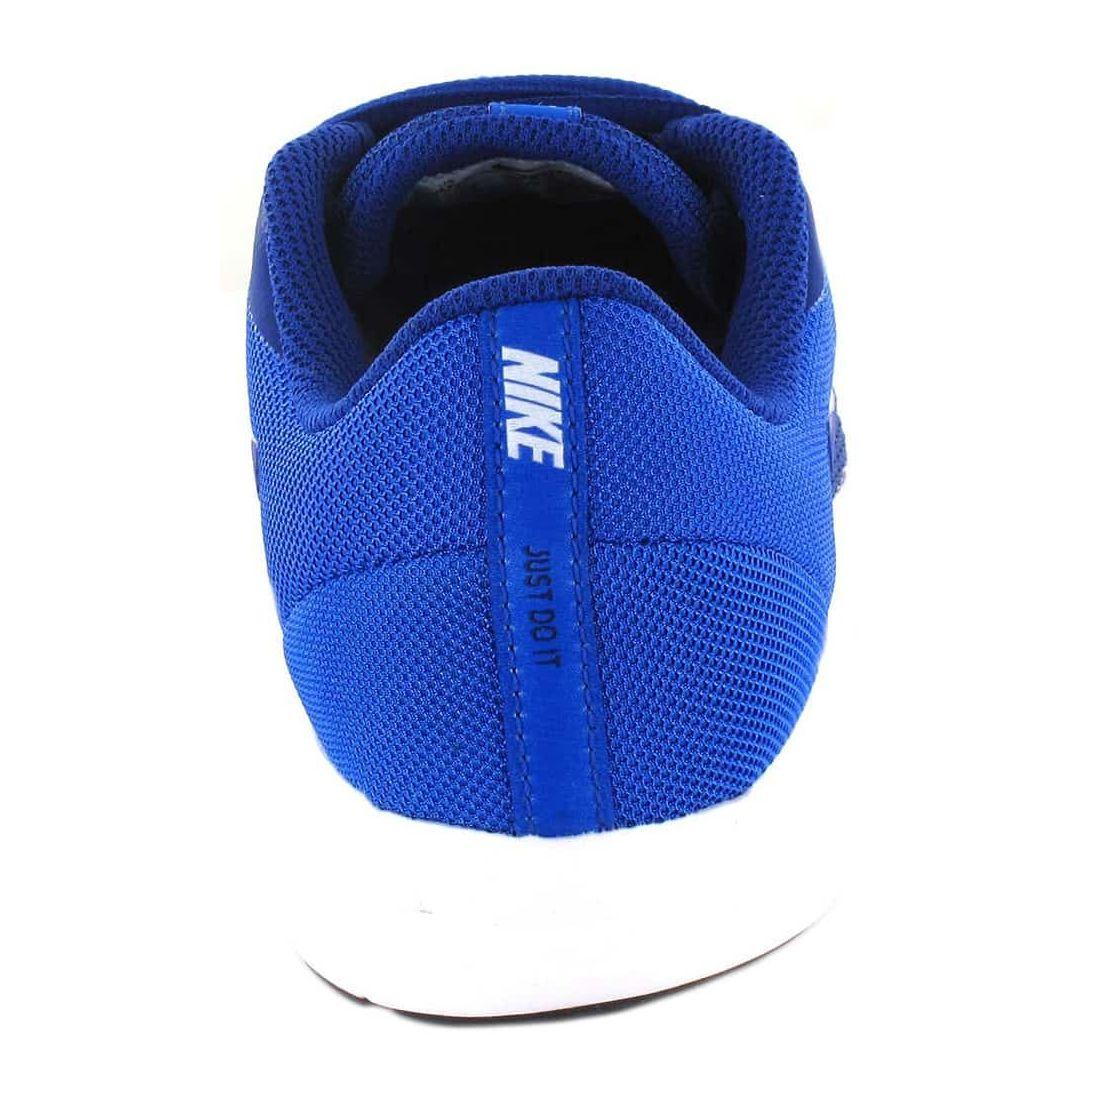 Nike Downshifter 9 GS 400 Nike Running Shoes Child running Shoes Running Sizes: 36, 37,5, 38, 39, 40; Color: blue